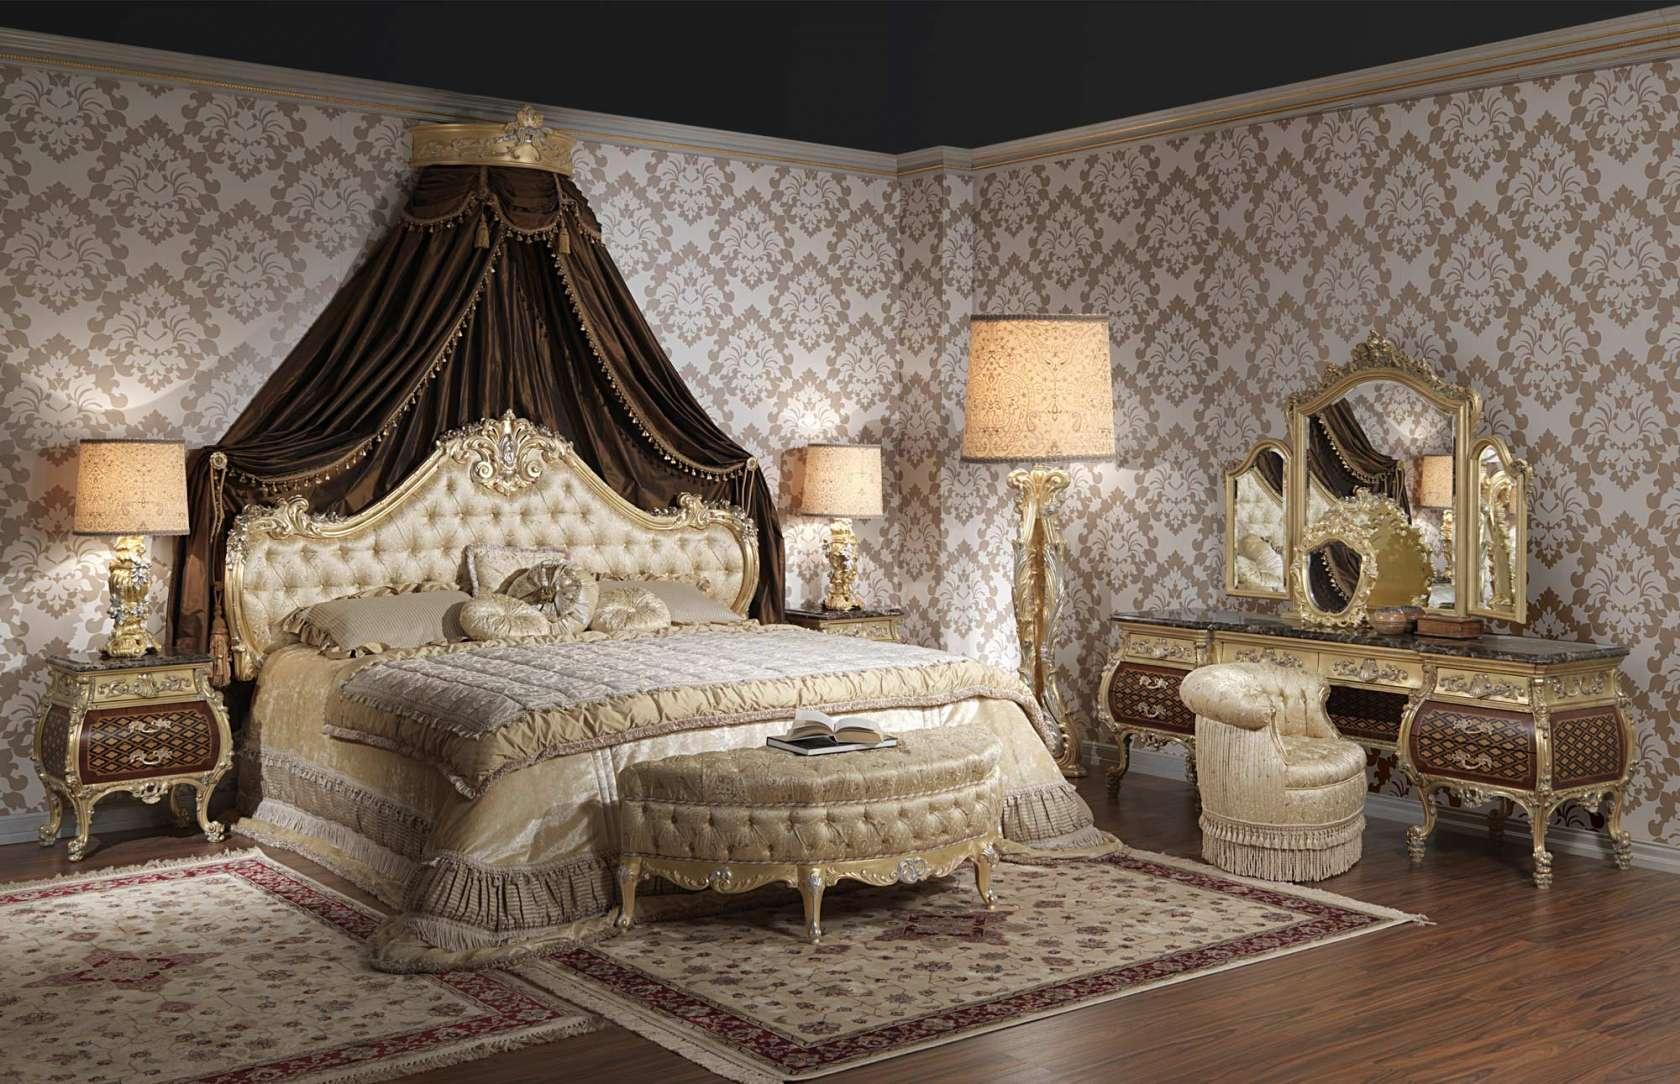 Luxurious Bedroom Furniture Luxury Bedroom Emperador Gold 397 931 Vimercati Classic Furniture